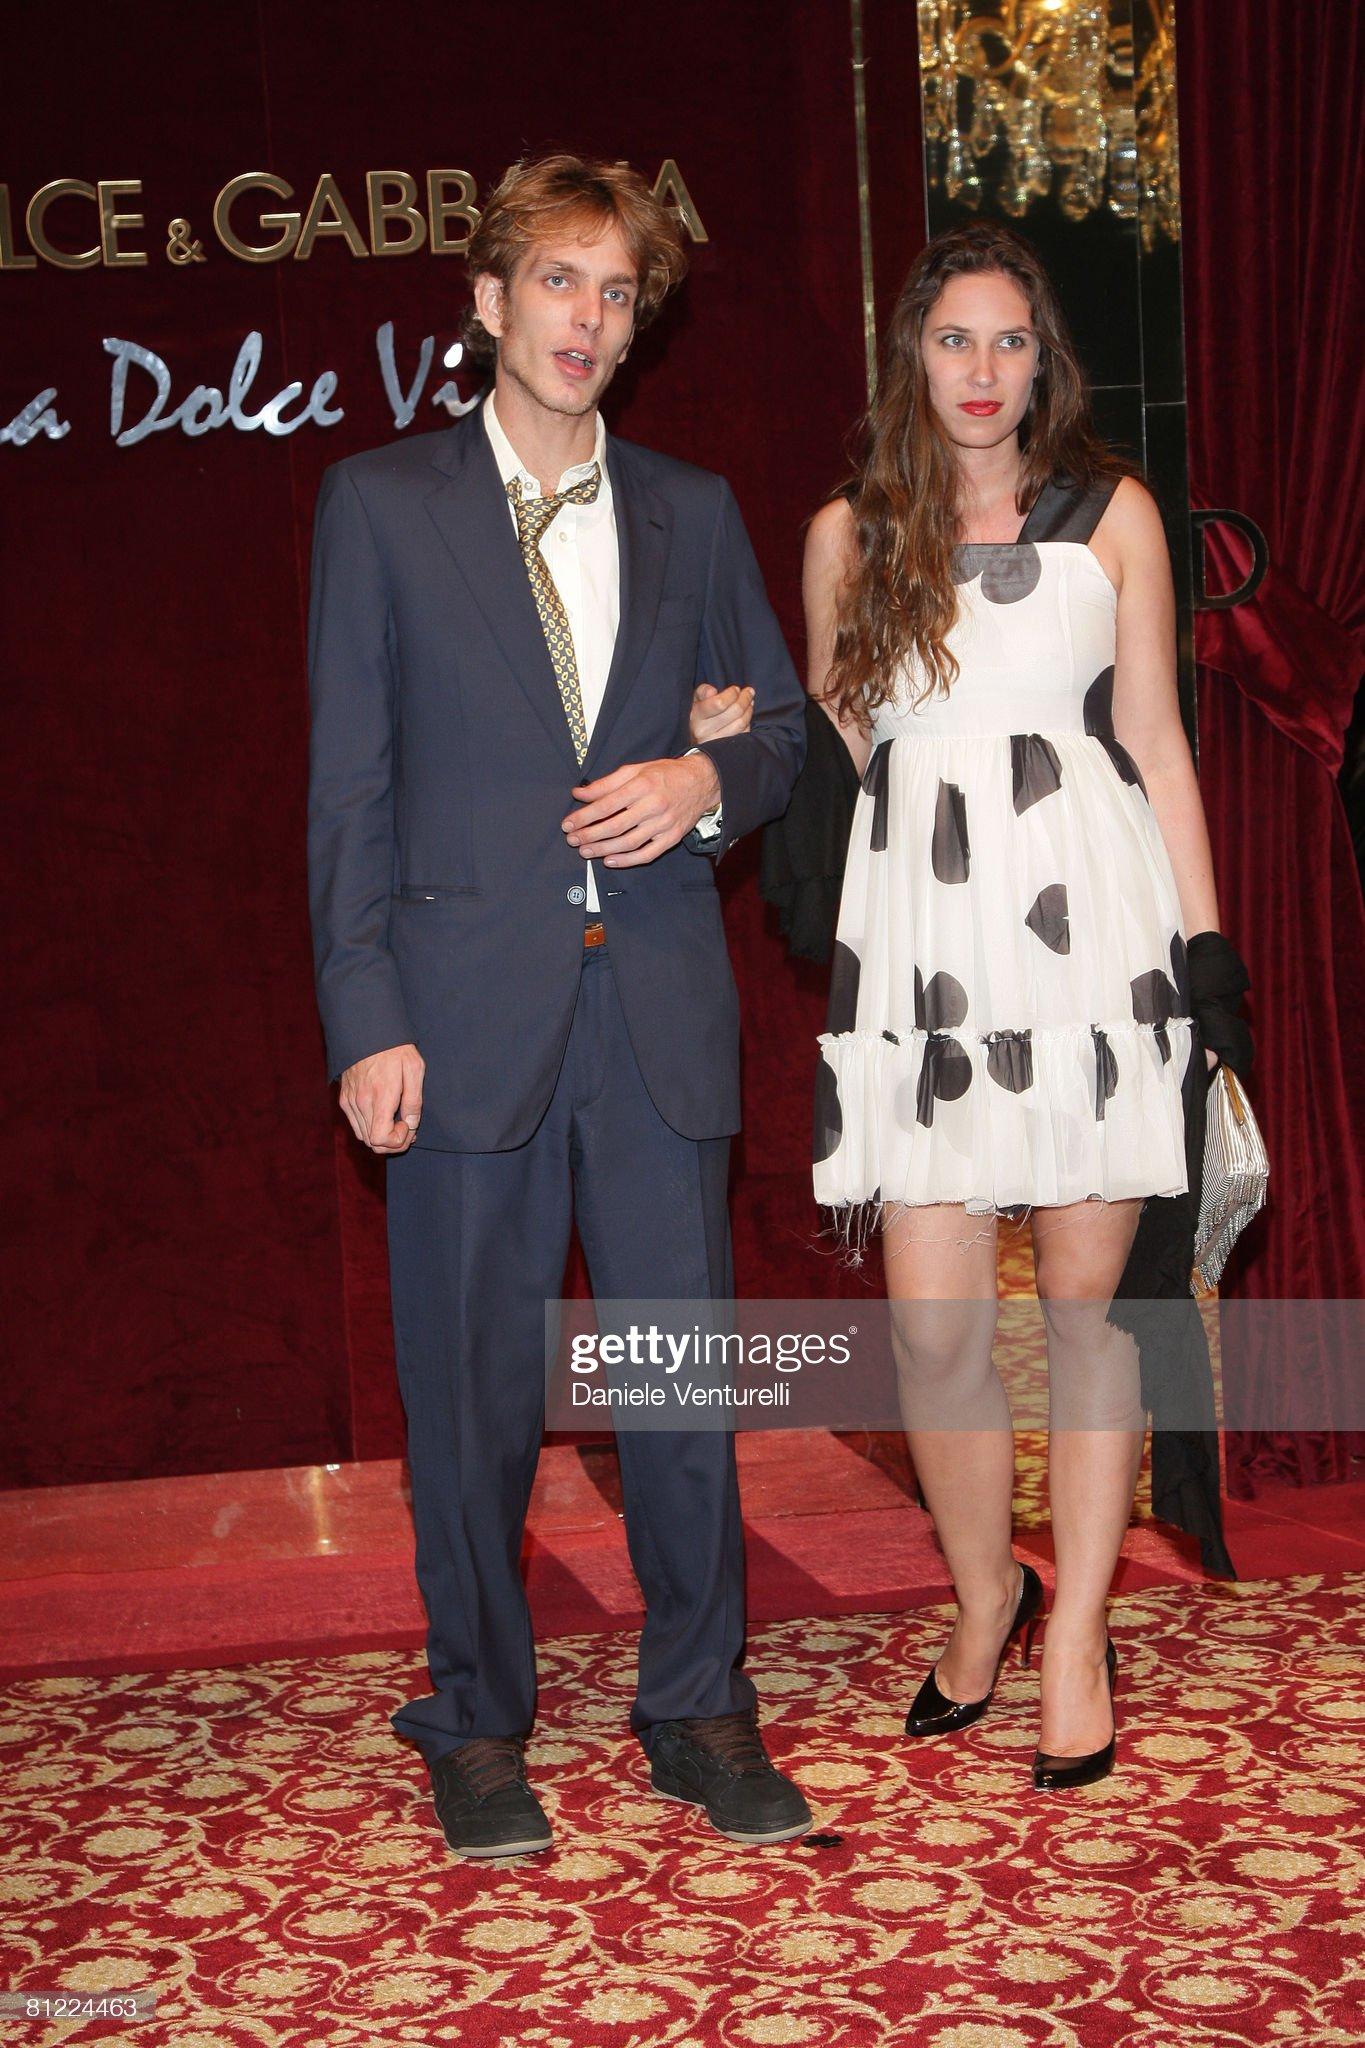 2008 Cannes Film Festival - Dolce & Gabbana Party -- Arrivals  : News Photo